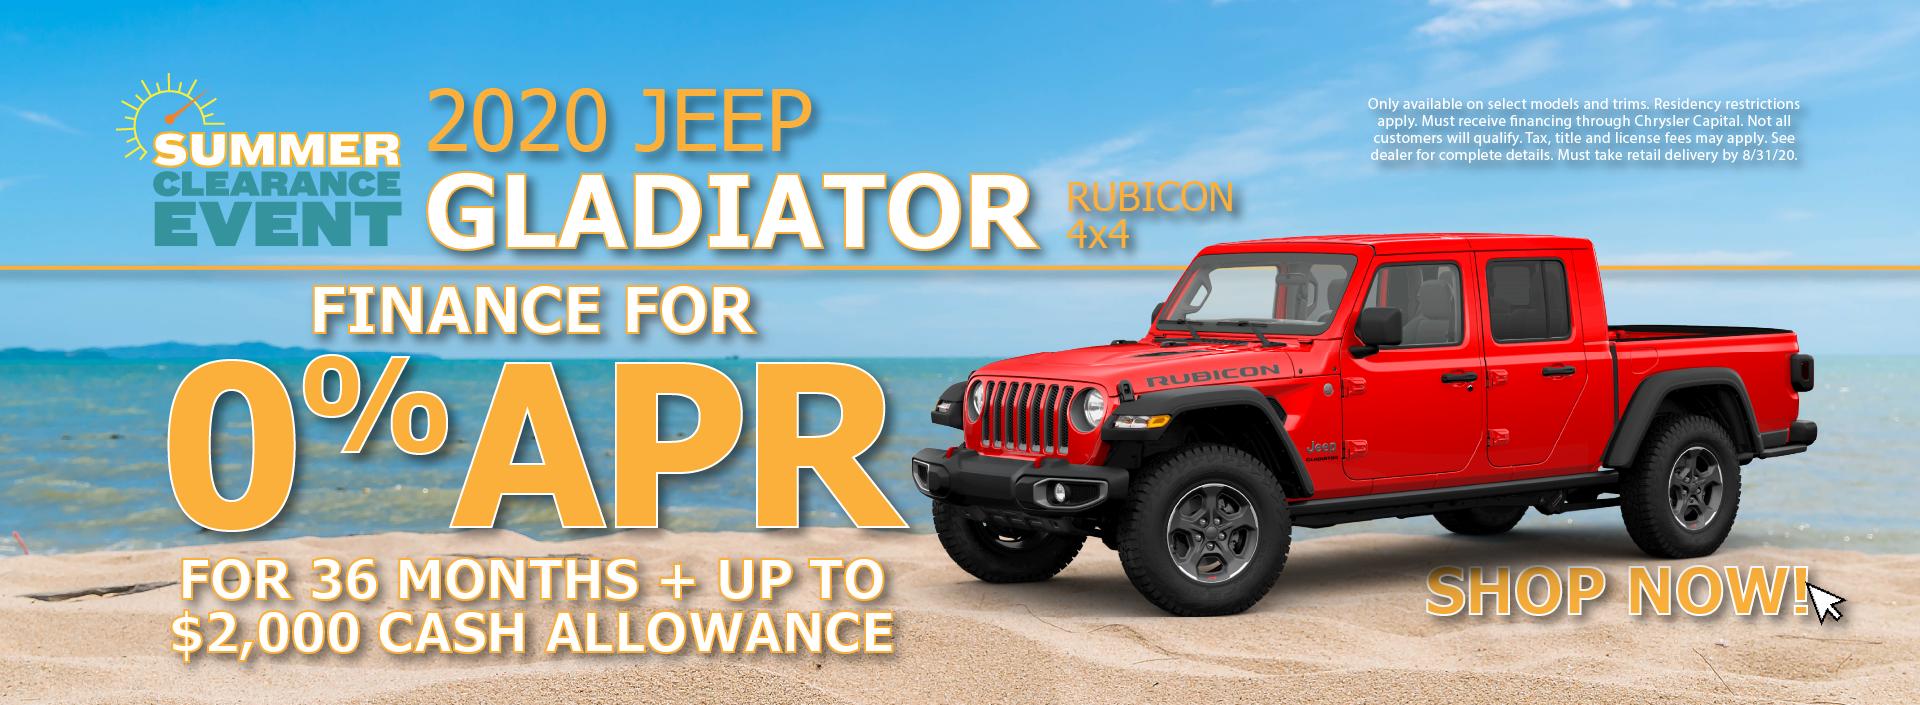 2020 Jeep Gladiator 0% APR